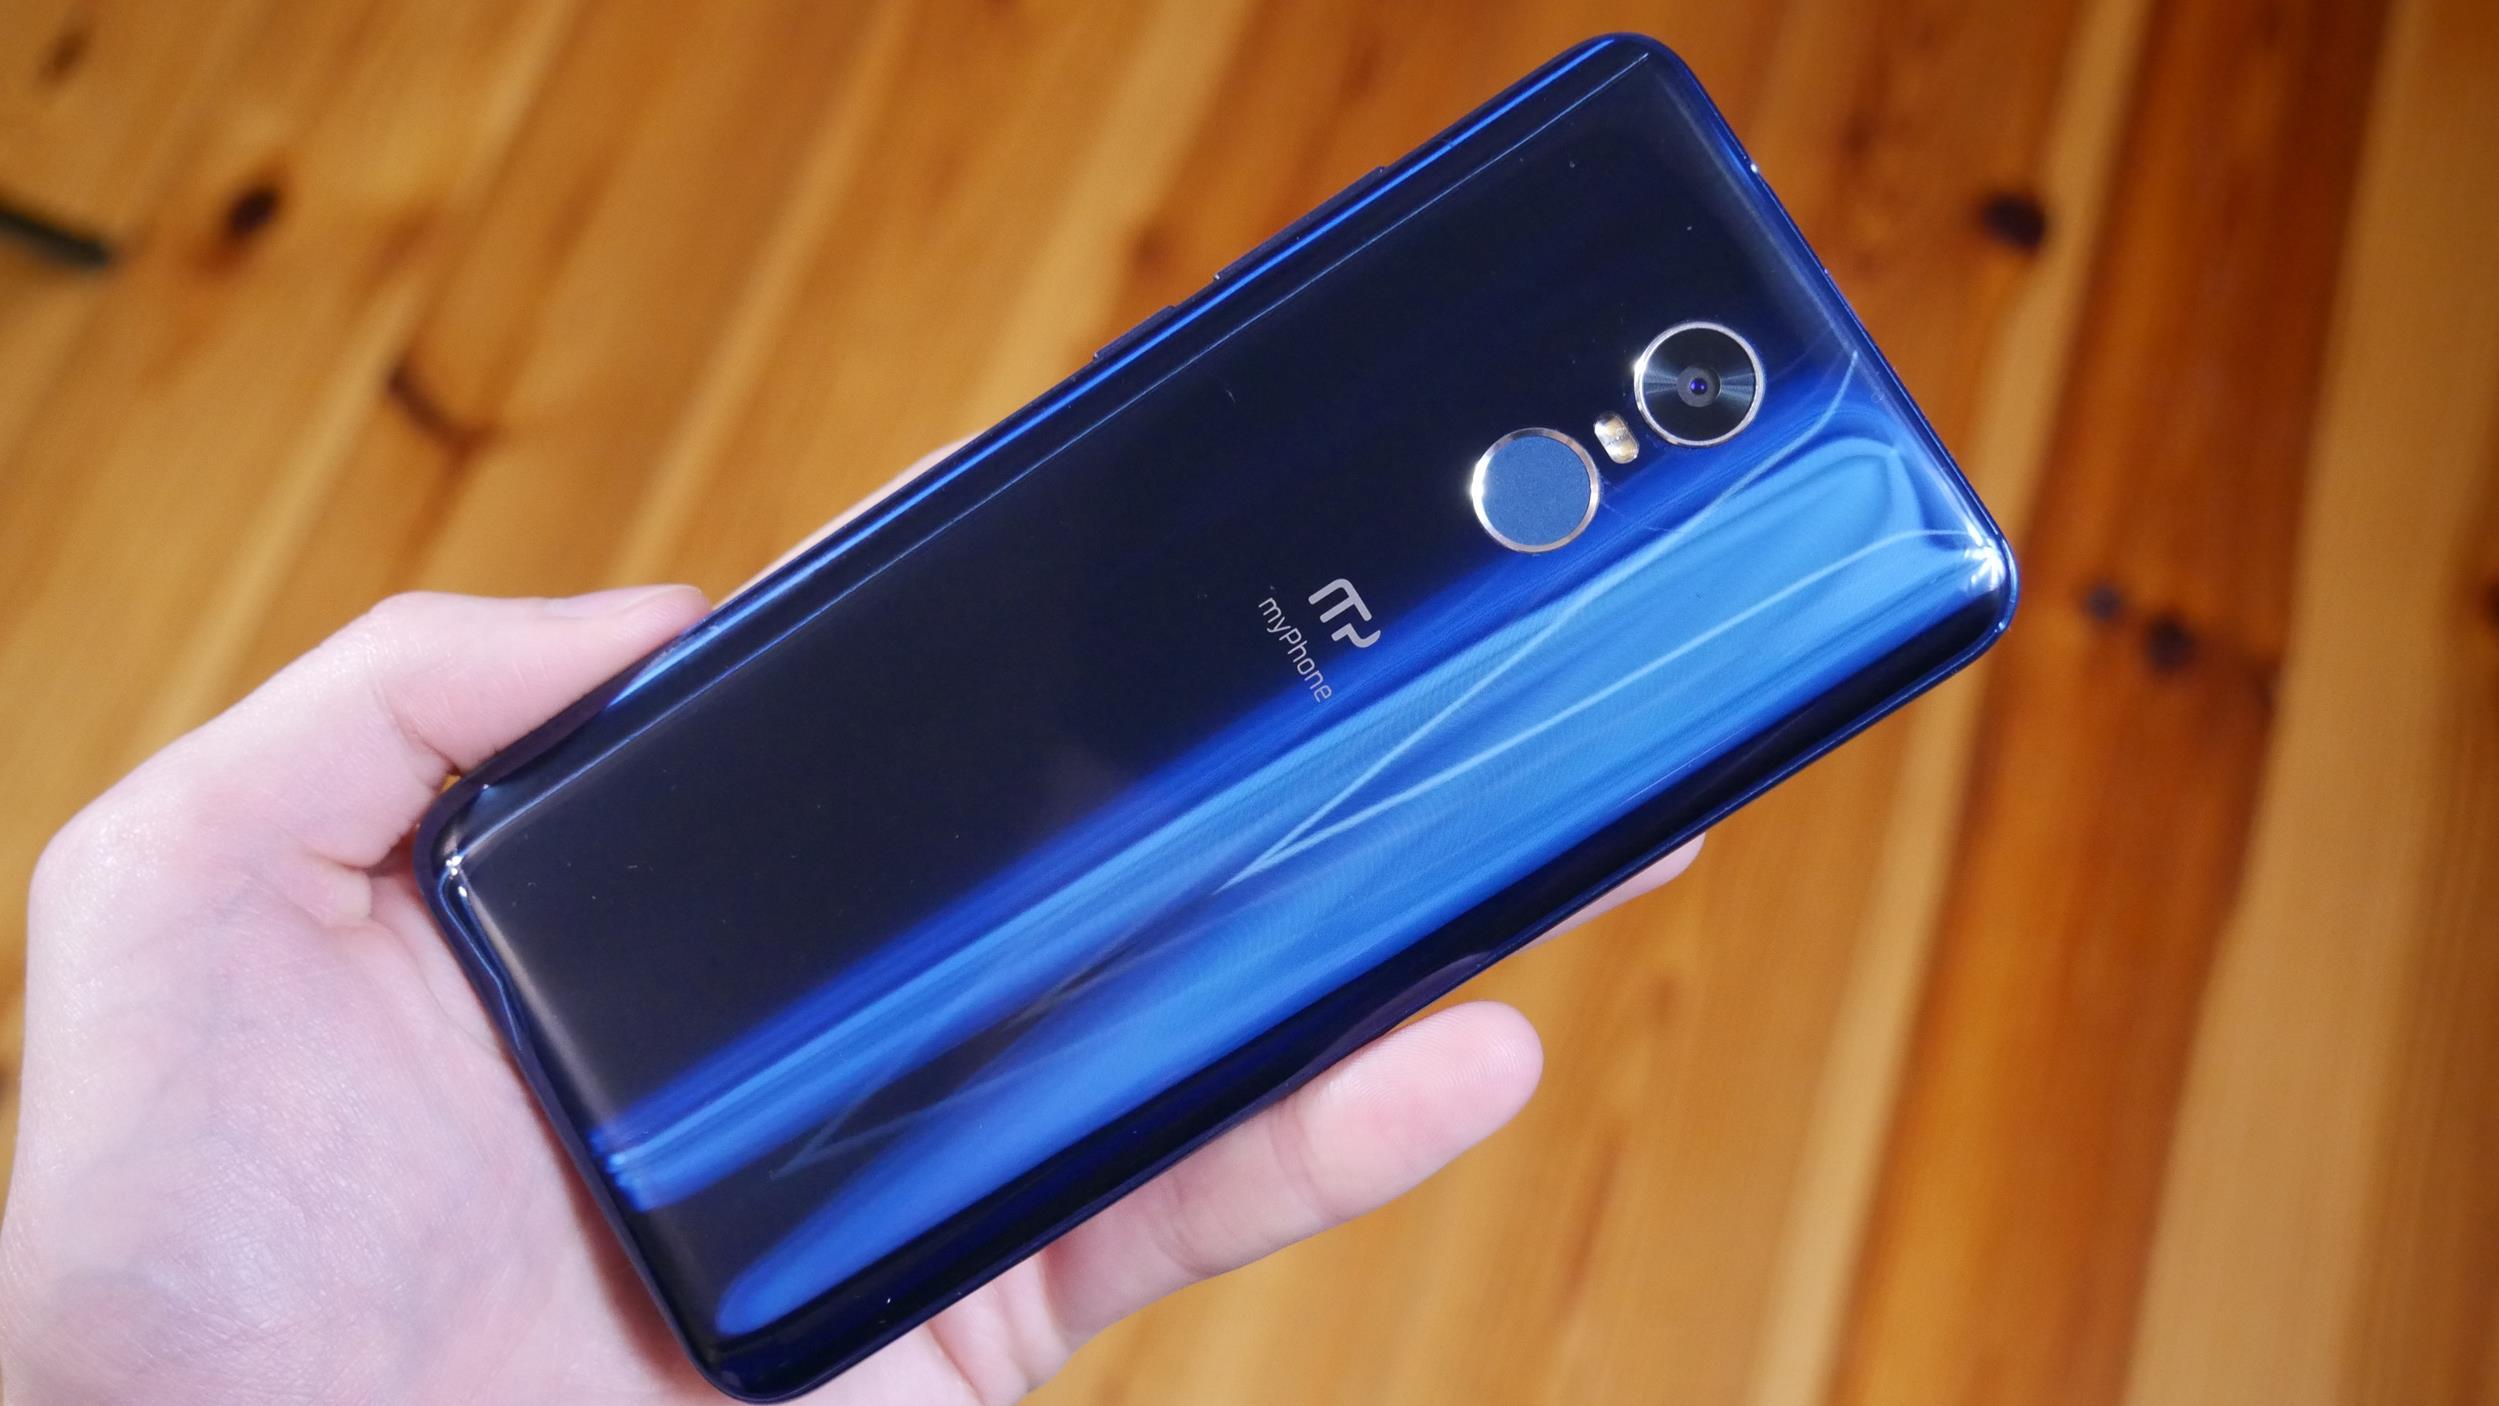 Jaki smartfon warto kupić na Komunię? 17